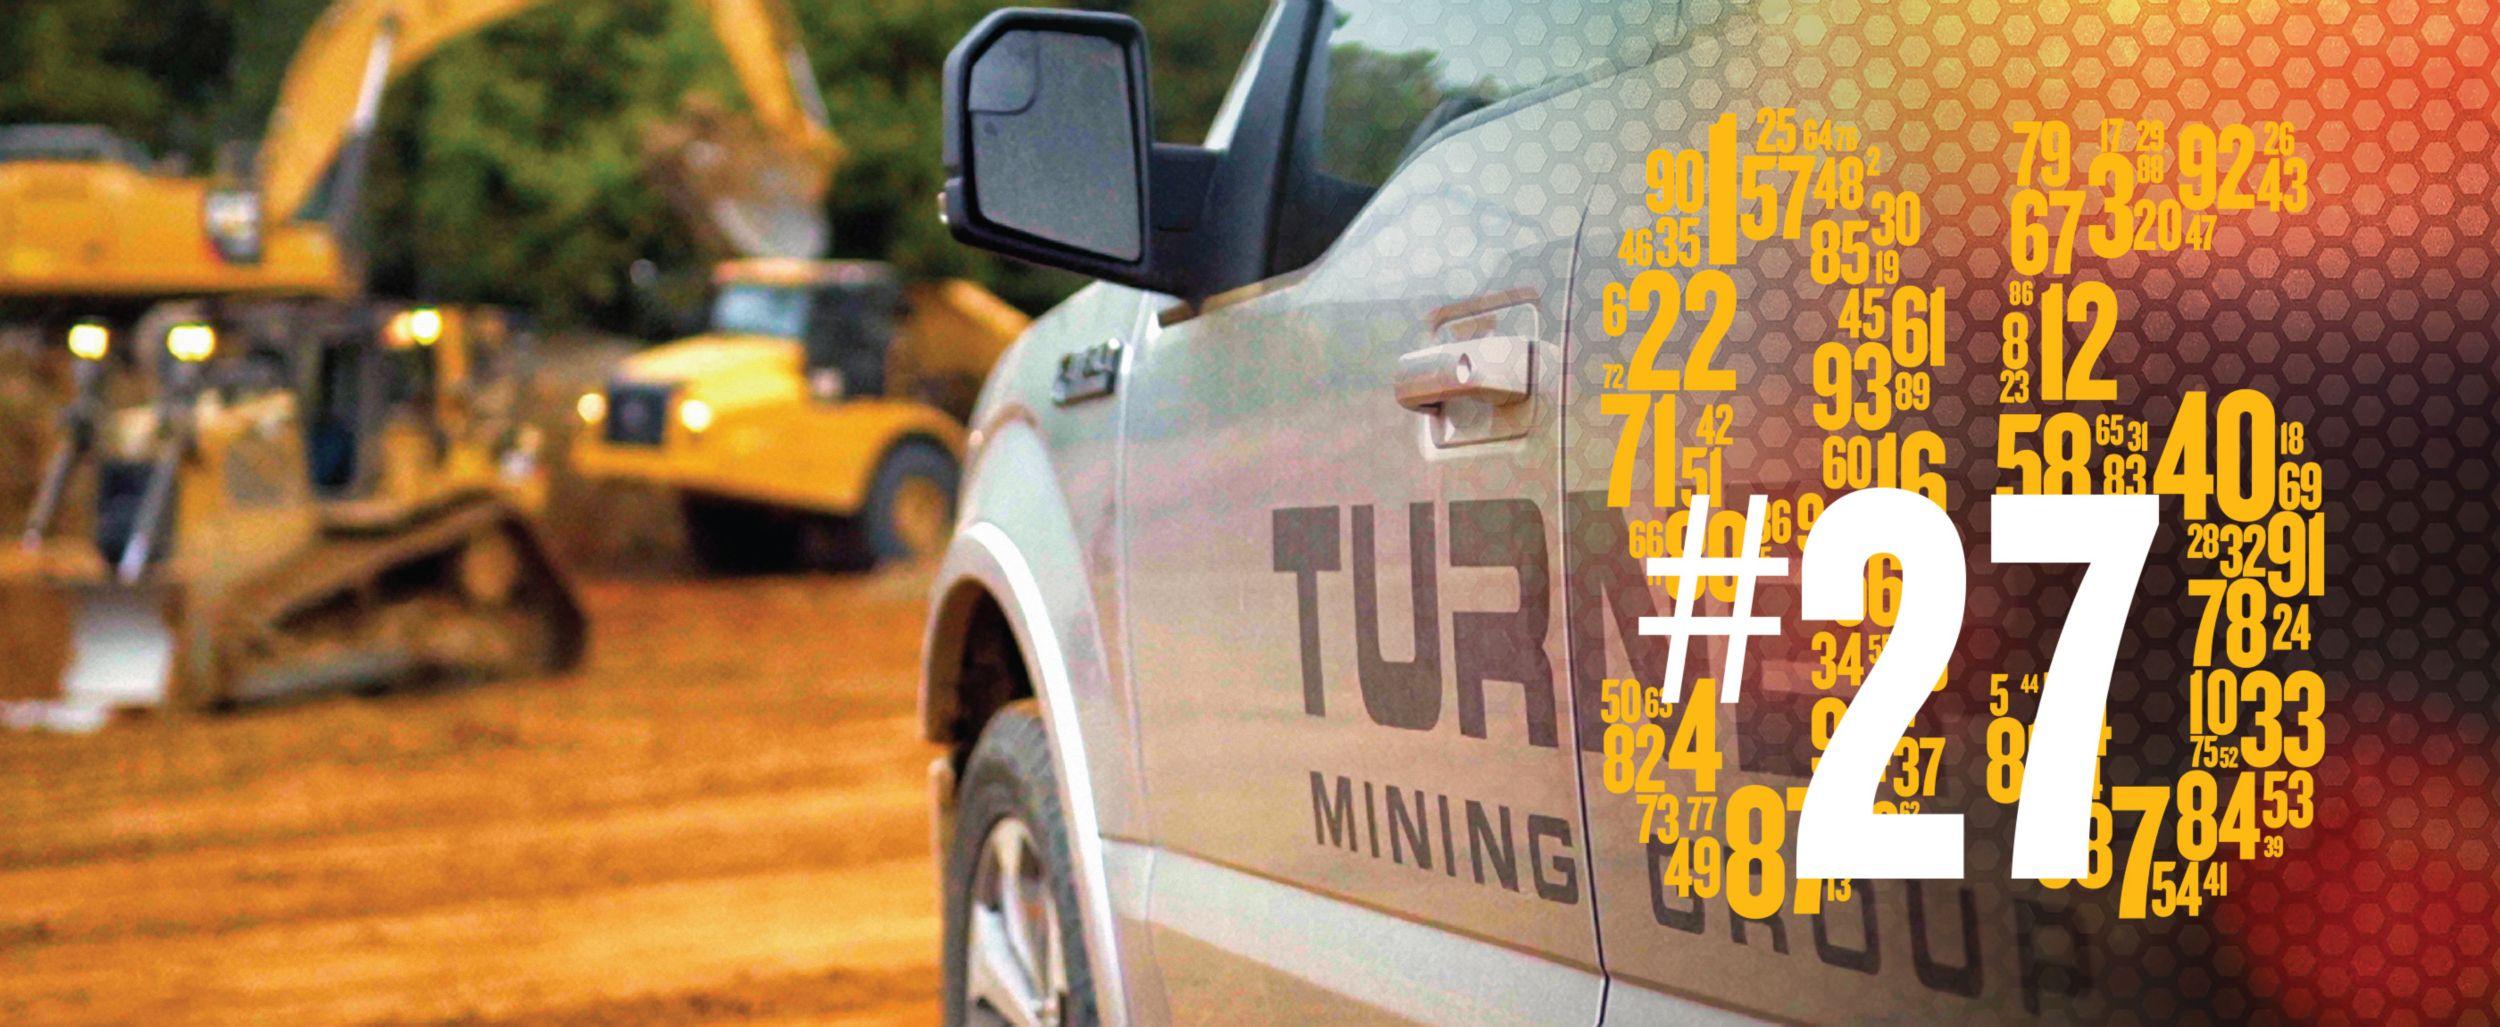 Turner Mining #27